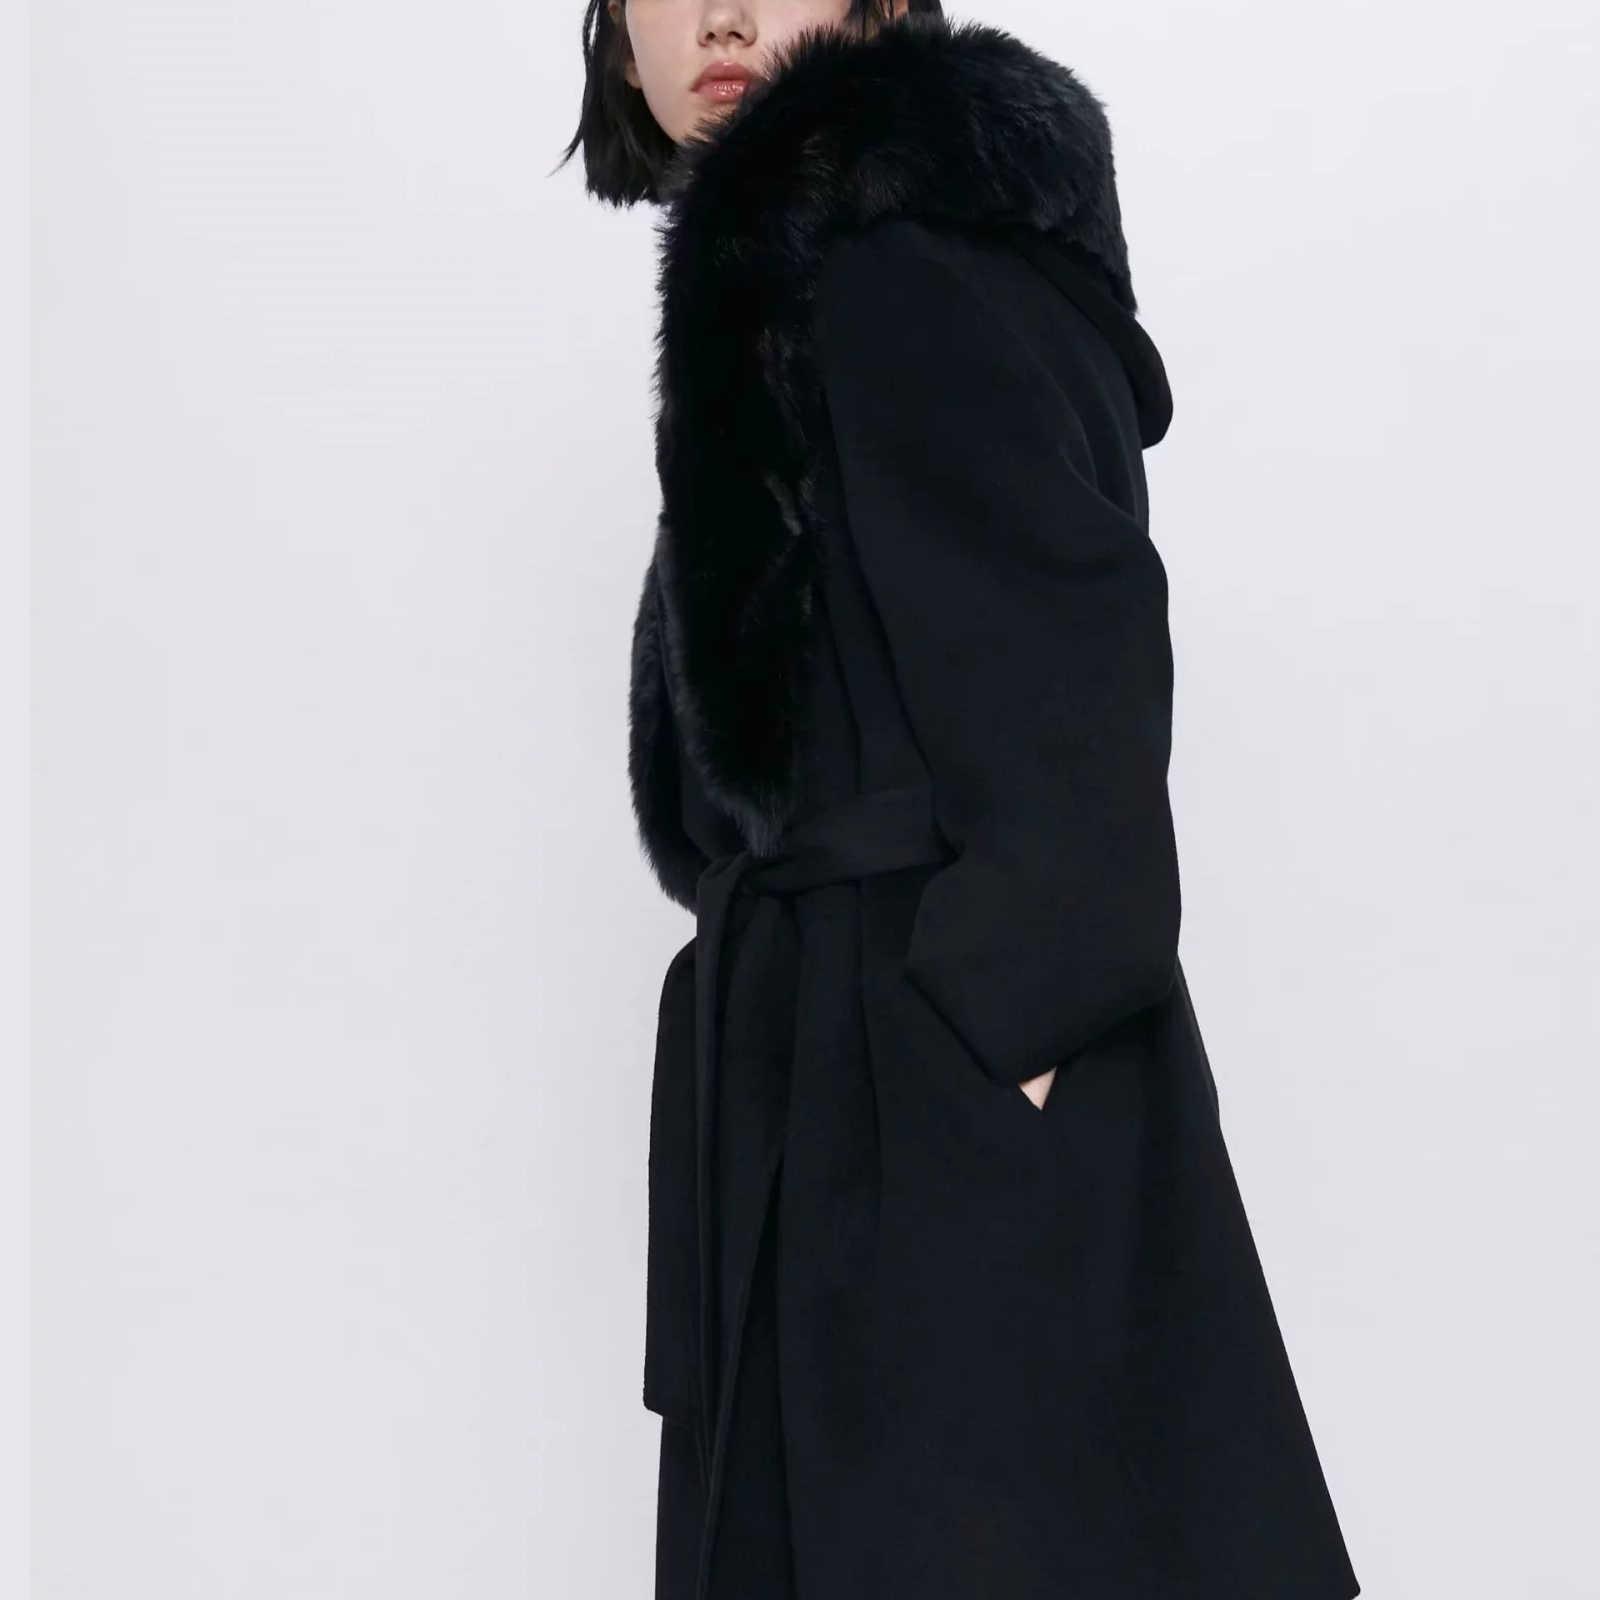 ZA معطف صوف للخريف والشتاء للنساء طوق فرو وشاحات دافئة غير رسمية ملابس خارجية للنساء معطف صوفي سترة نسائية ملابس نسائية